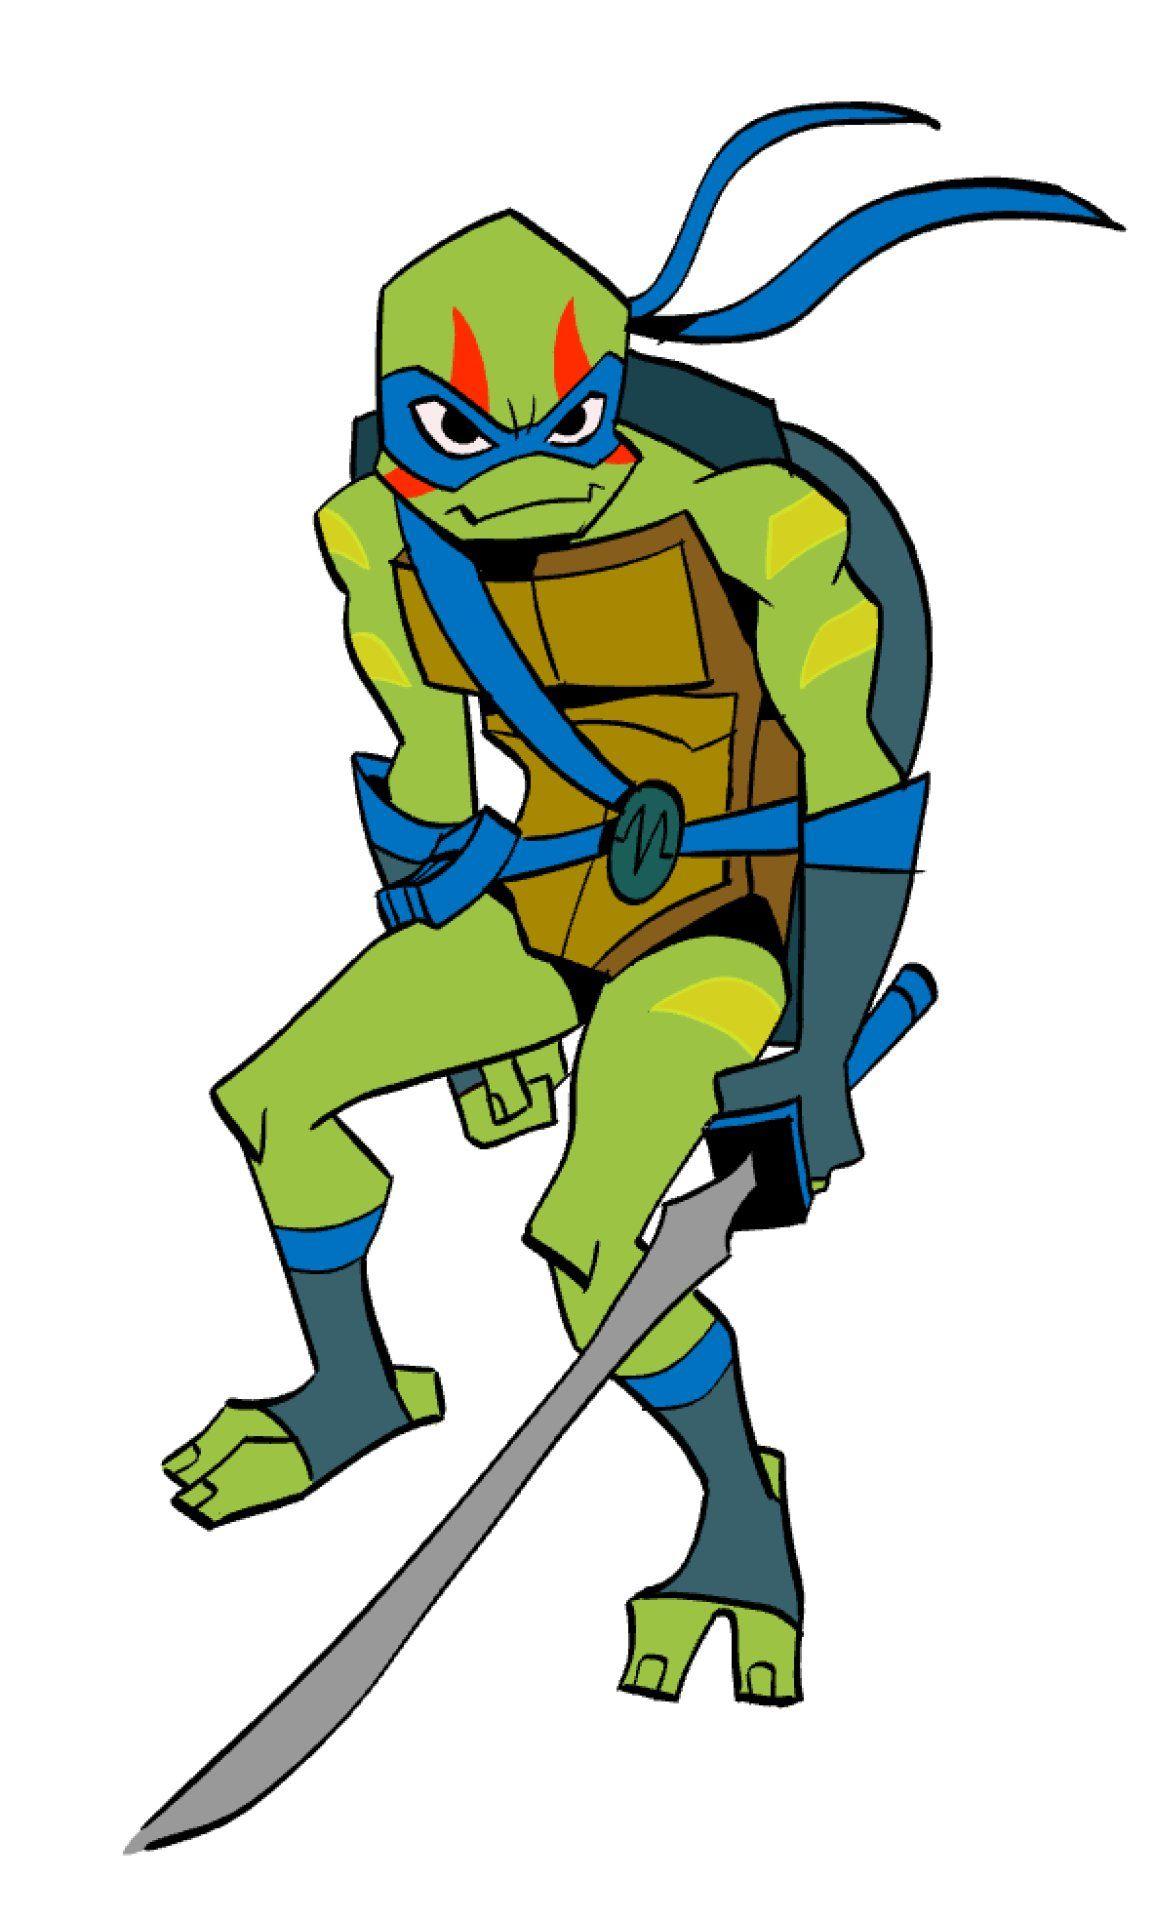 Max Collins On Twitter In 2021 Teenage Ninja Turtles Turtle Drawing Teenage Mutant Ninja Turtles